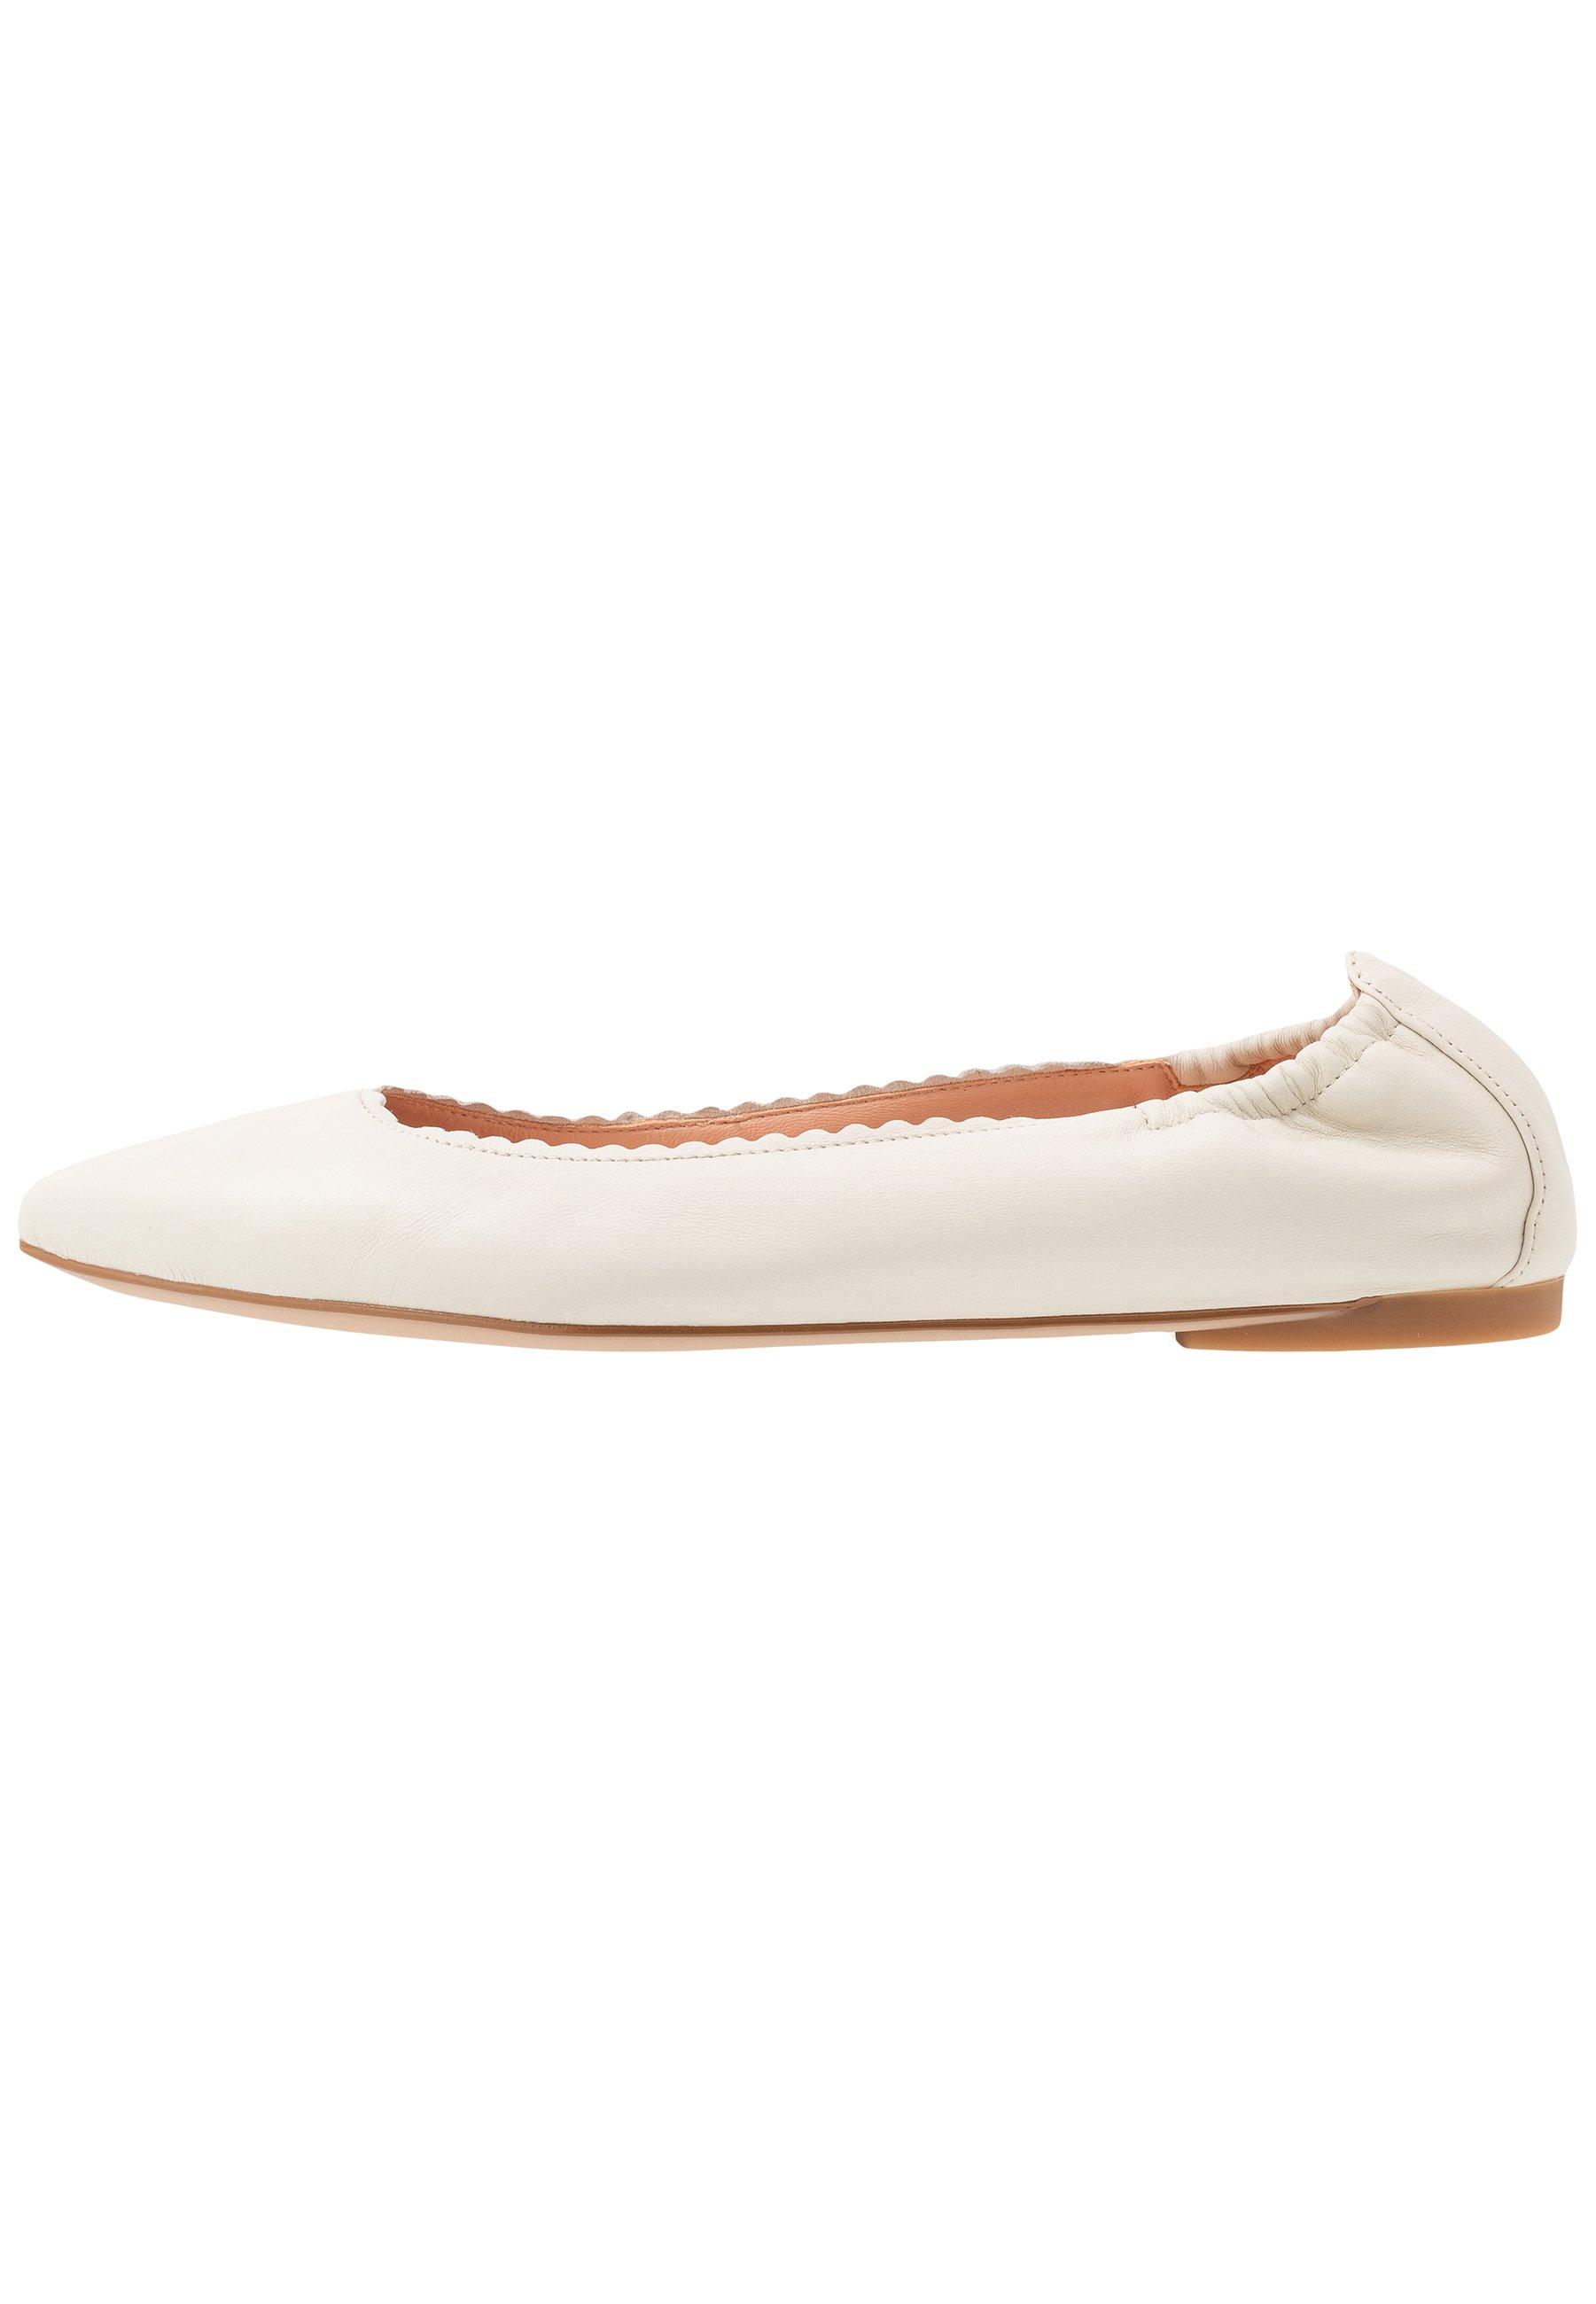 Unisa Aspas - Ballet Pumps Ivory